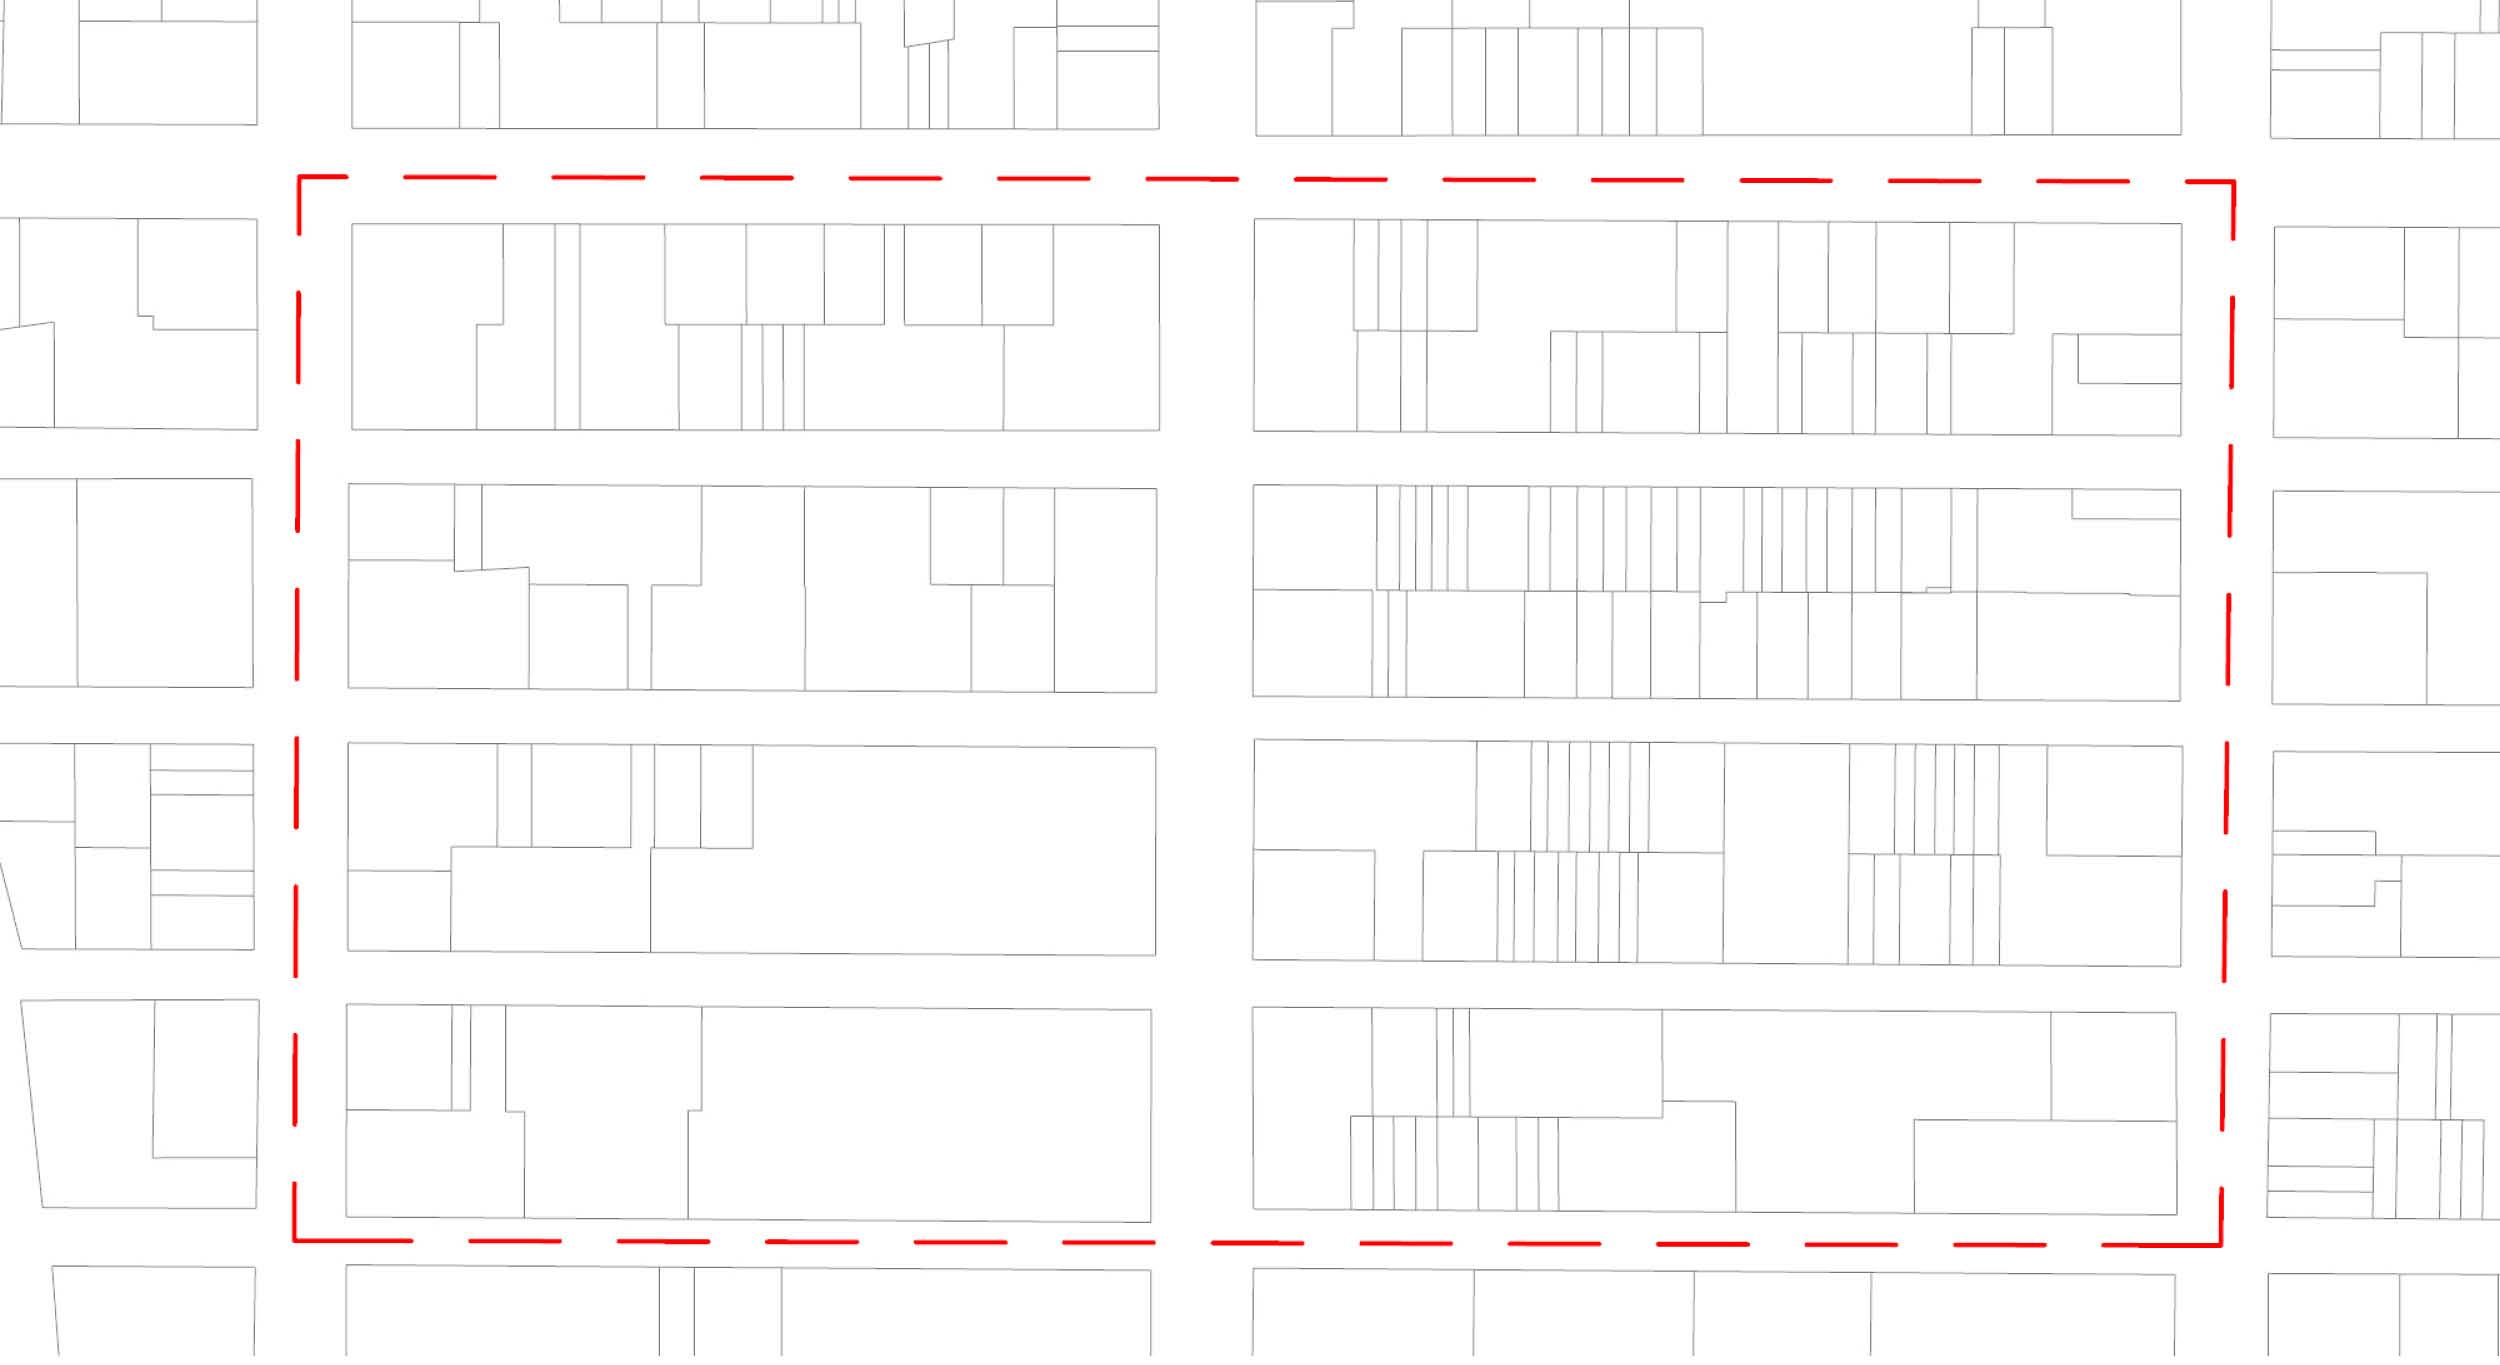 LD: FAR = Gross Floor Area / Street Center Line Area